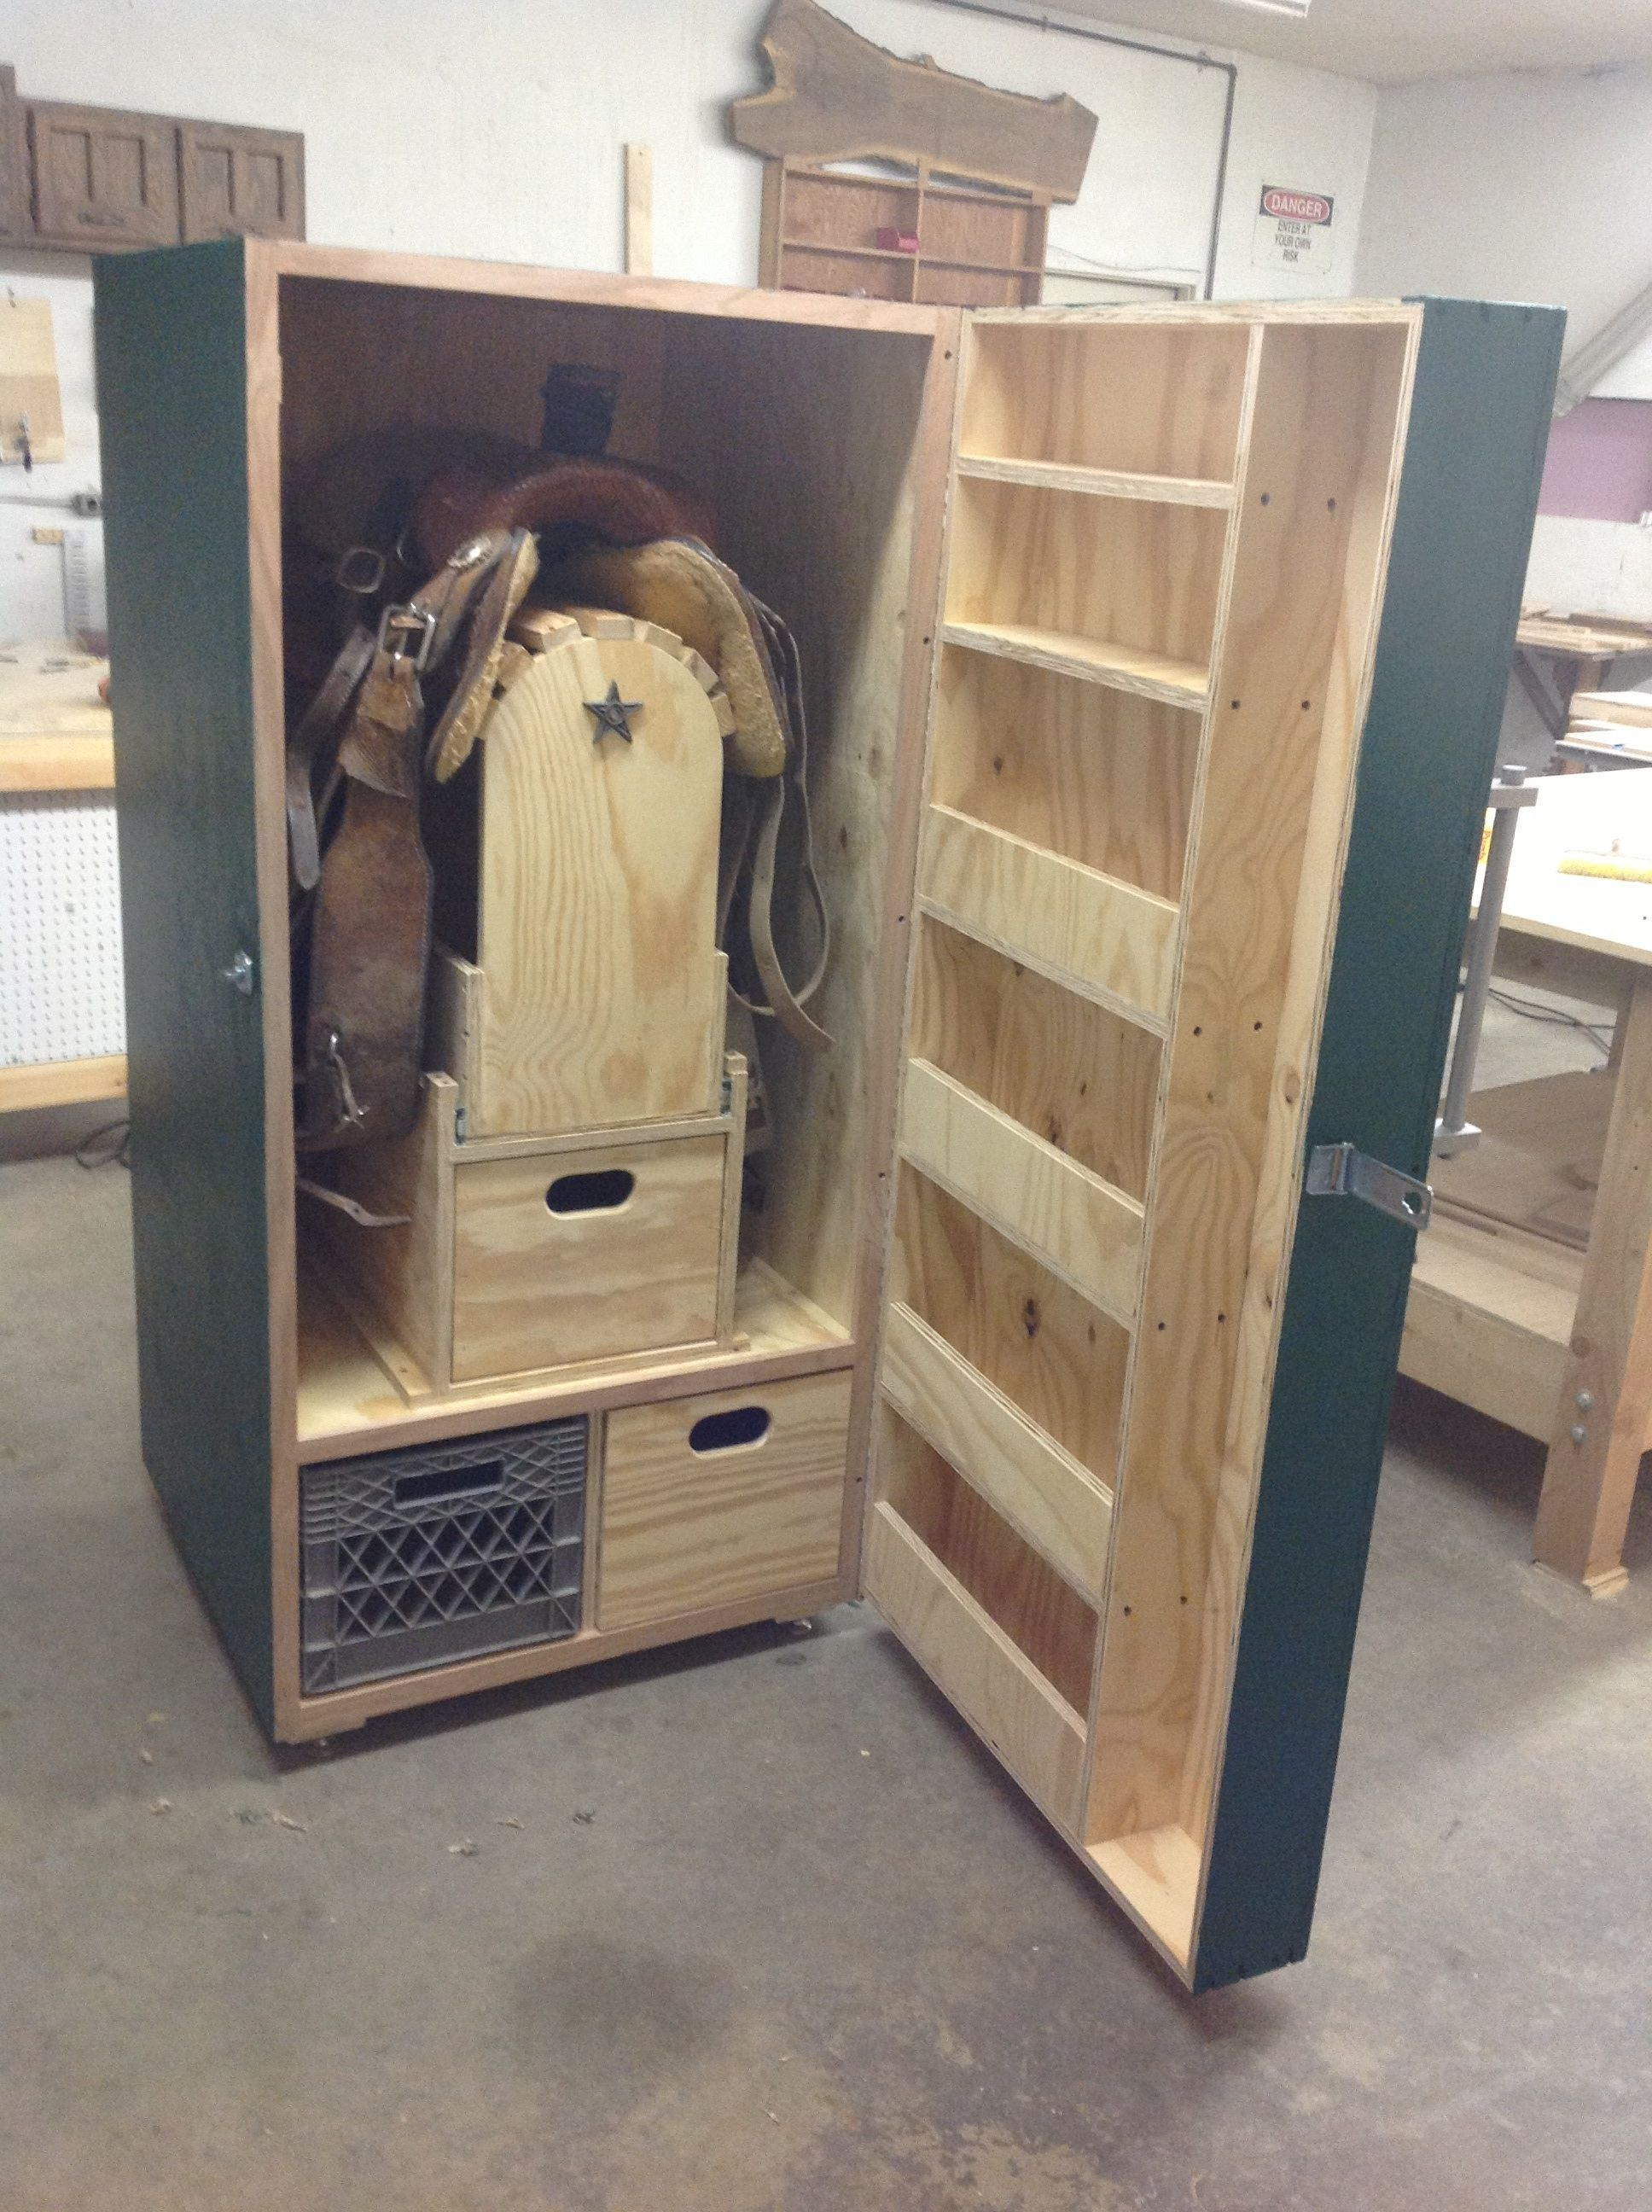 Image result for tack locker | The Ranch | Pinterest | Lockers ...